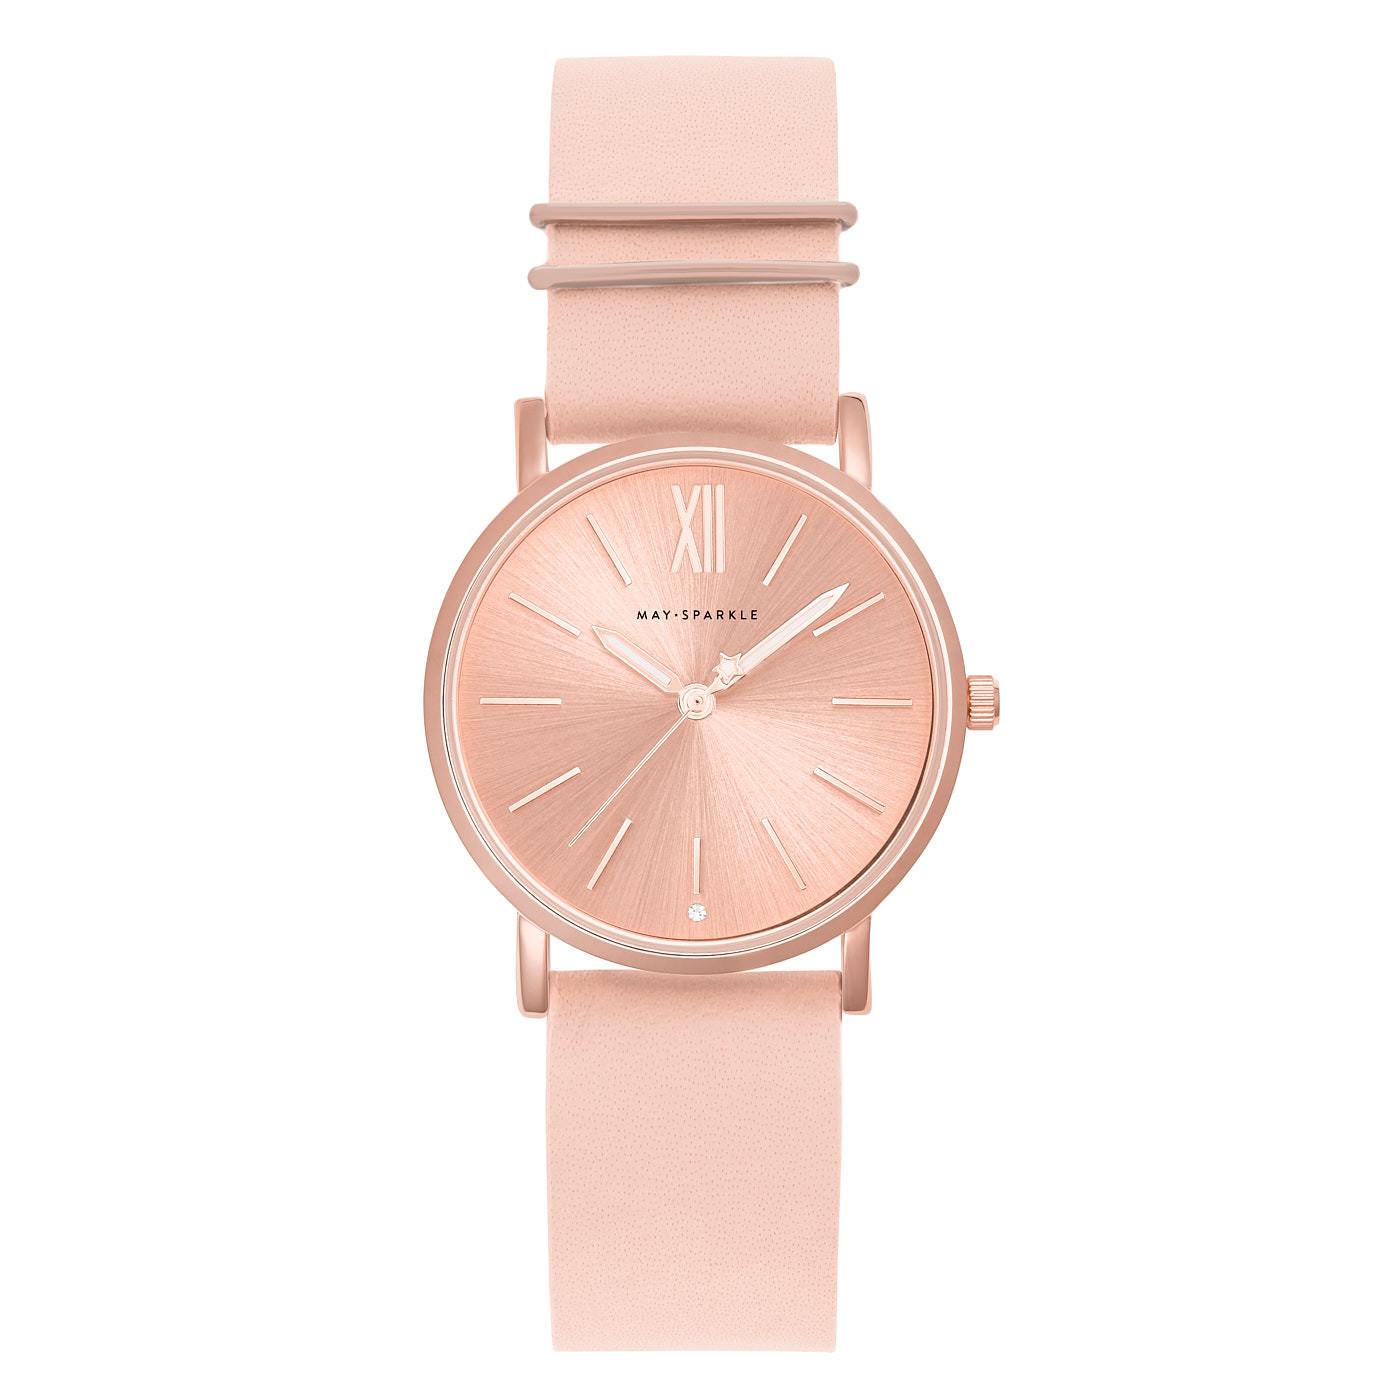 May Sparkle Classy Diva April Roze/Roségoudkleurig horloge MSC001-B